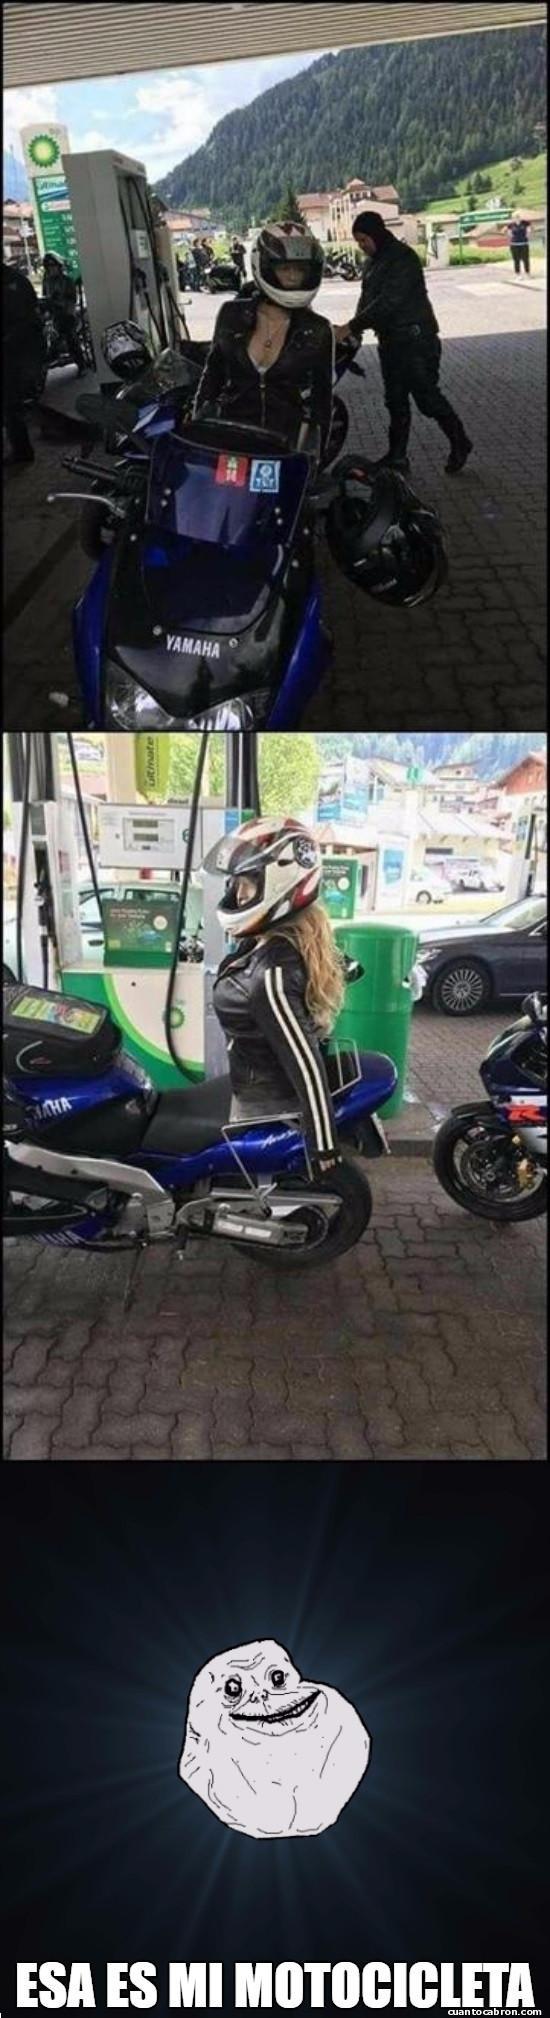 Meme_otros - La motocicleta ideal para Forever Alone